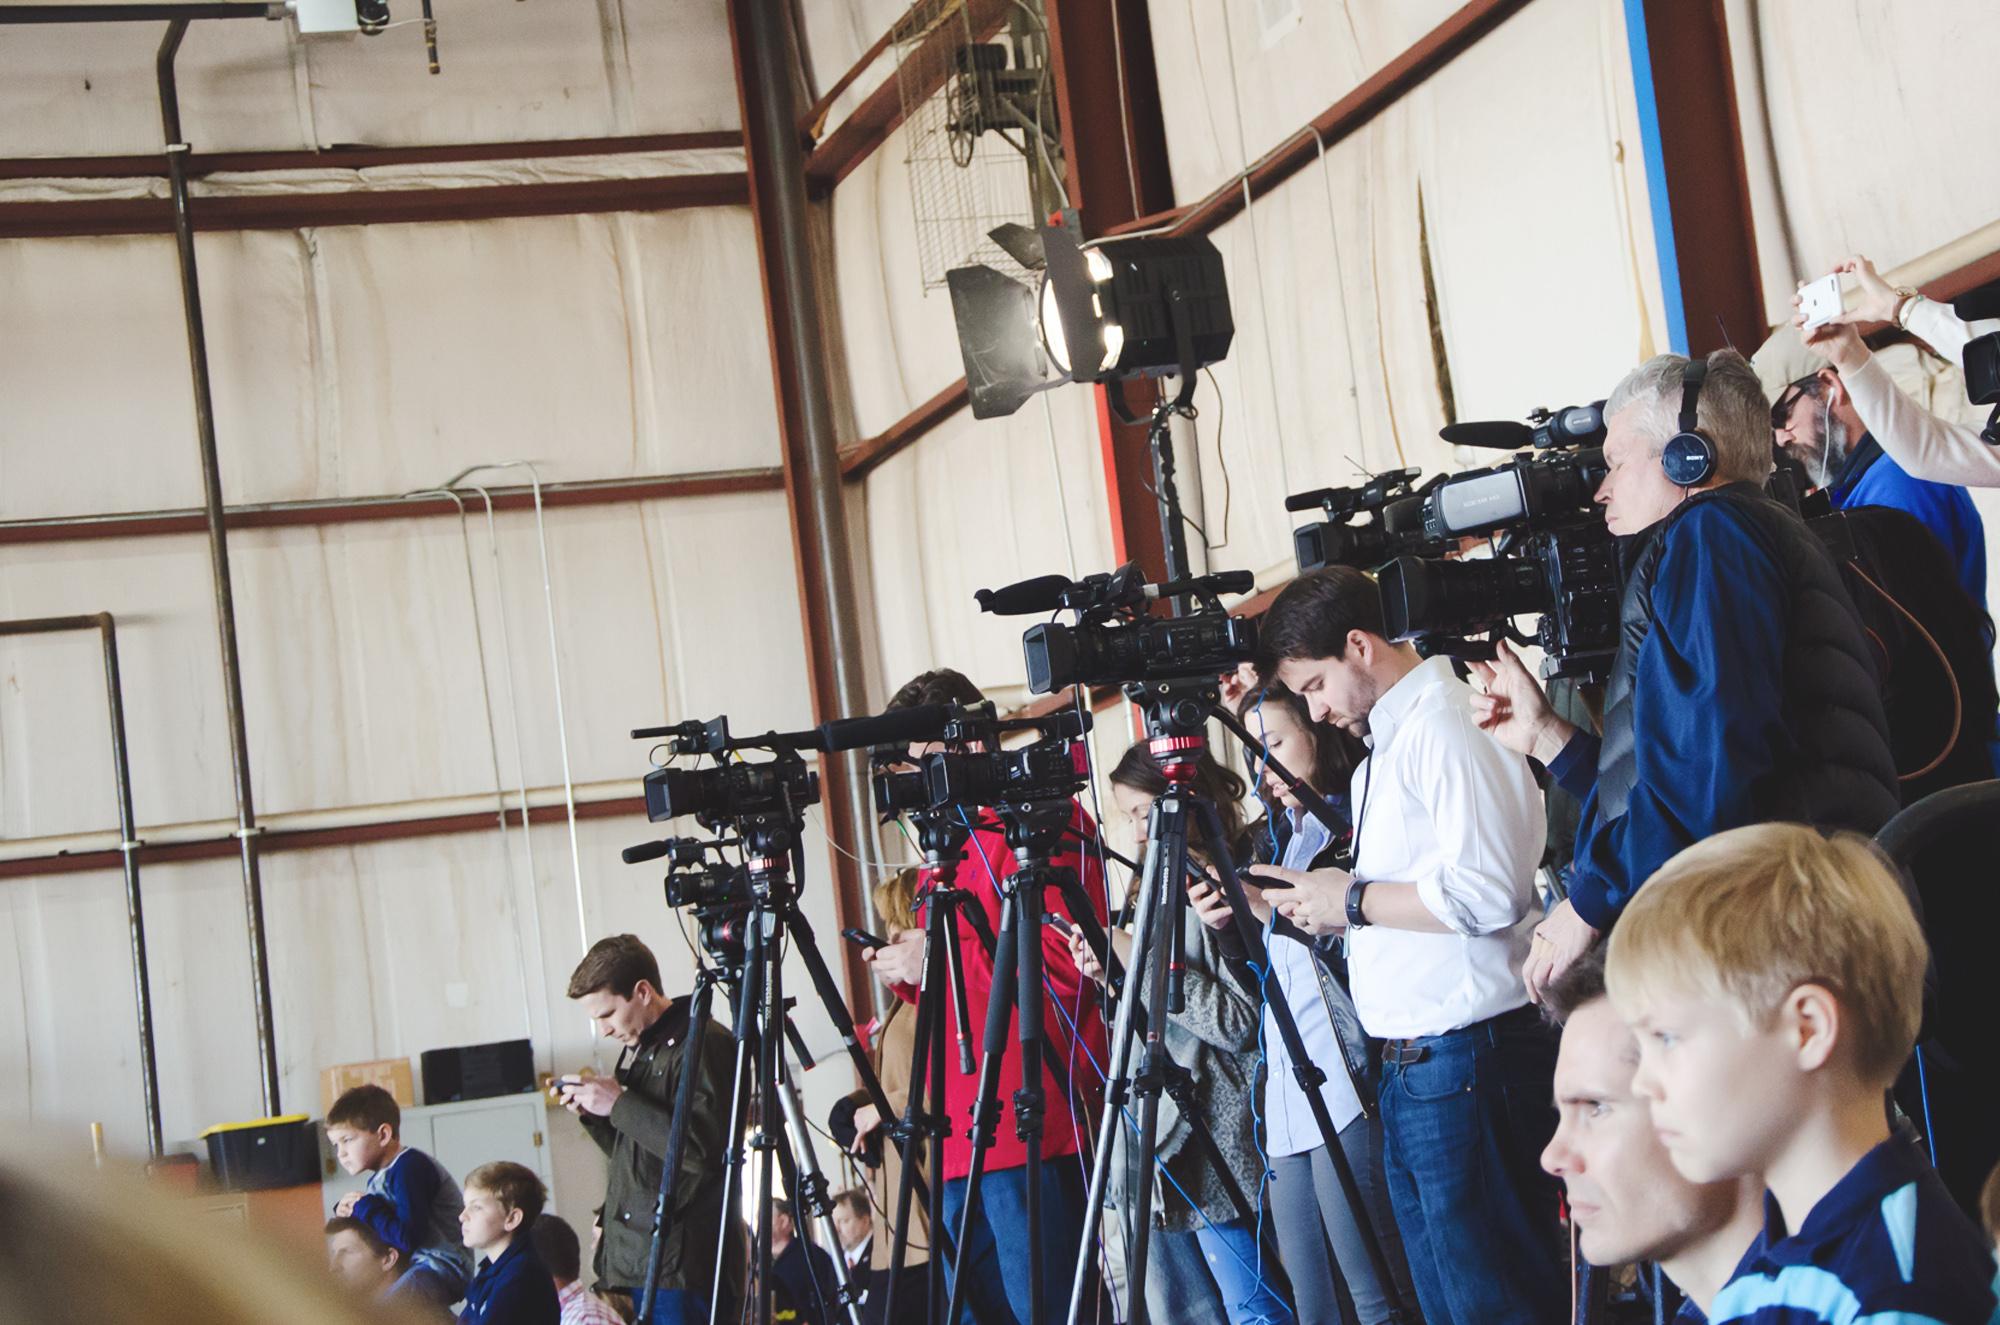 Tweeting journalists